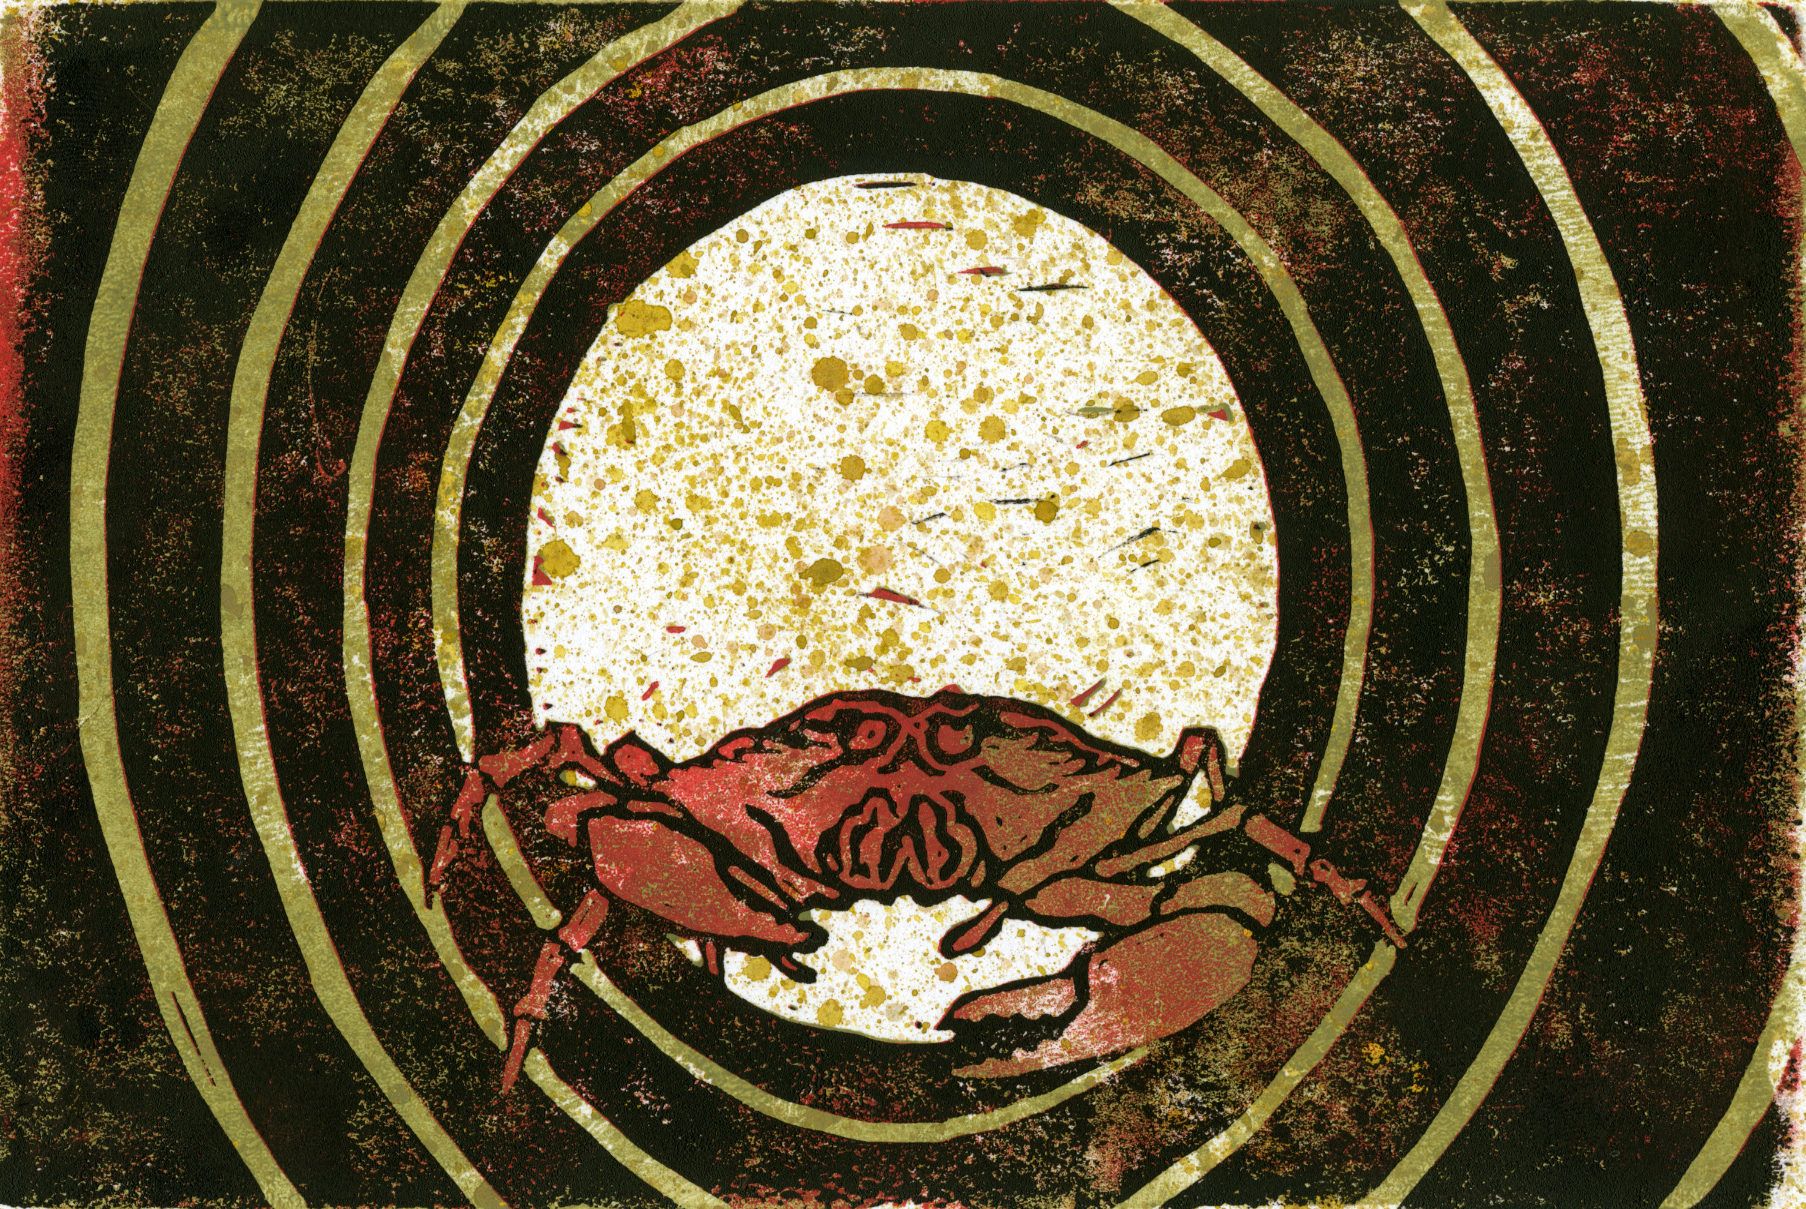 lauritano_2013_crab2.jpg